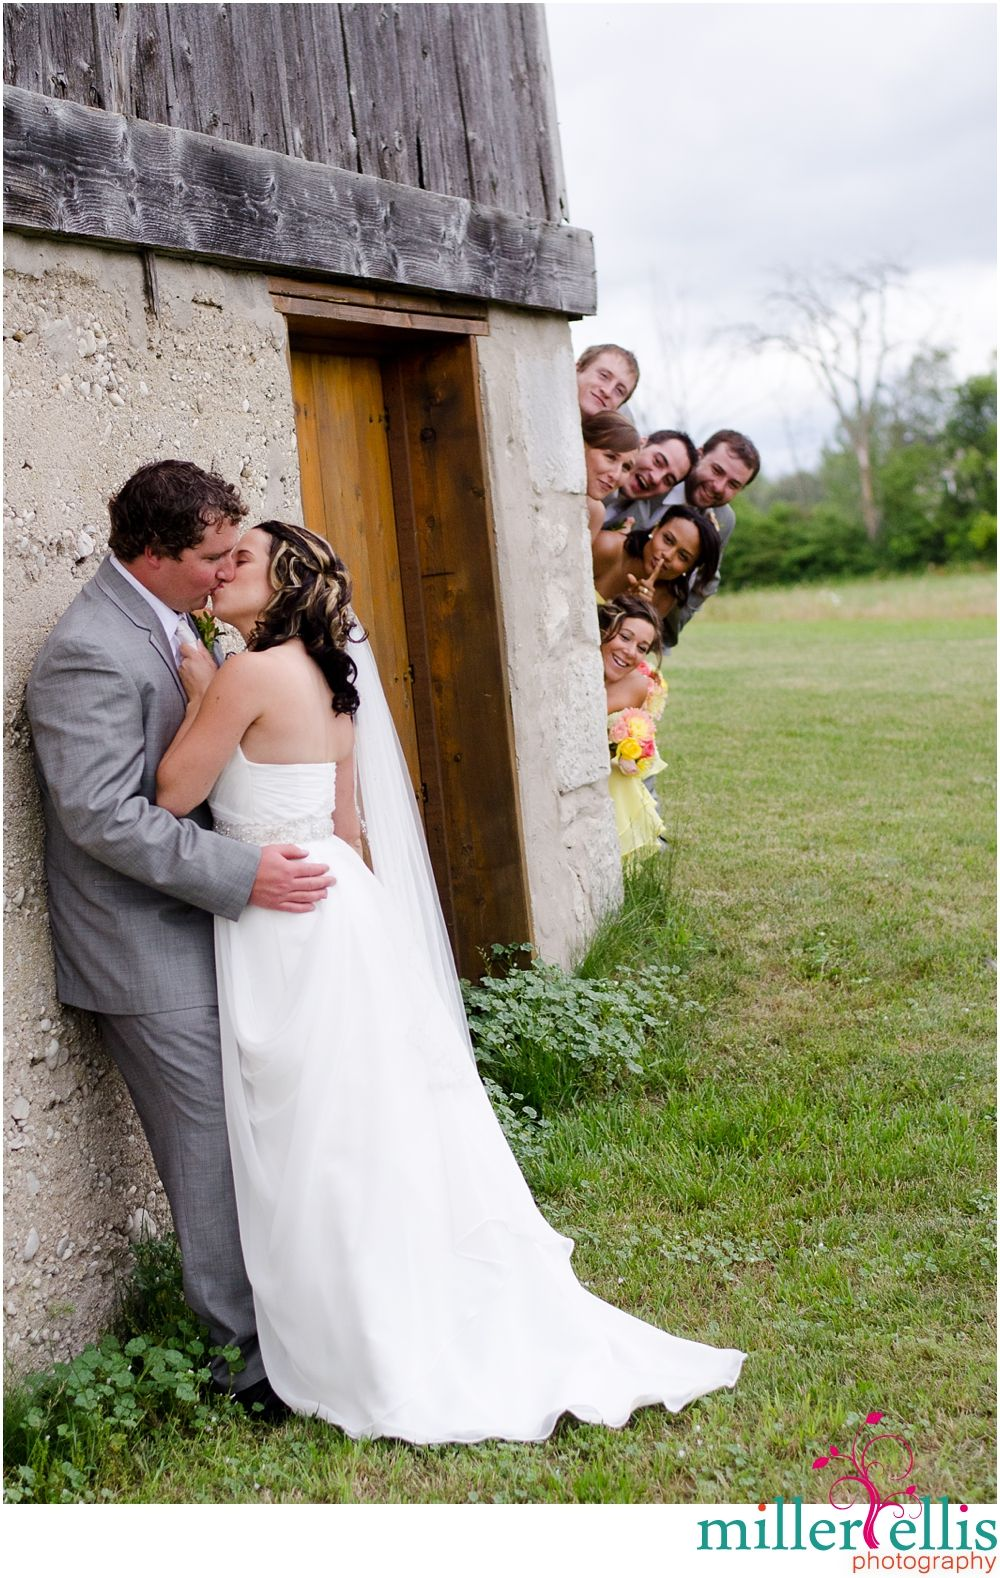 Fun Bridal Party Shot! Hahahaha! Spies the lot of them! ;) | wedding ...